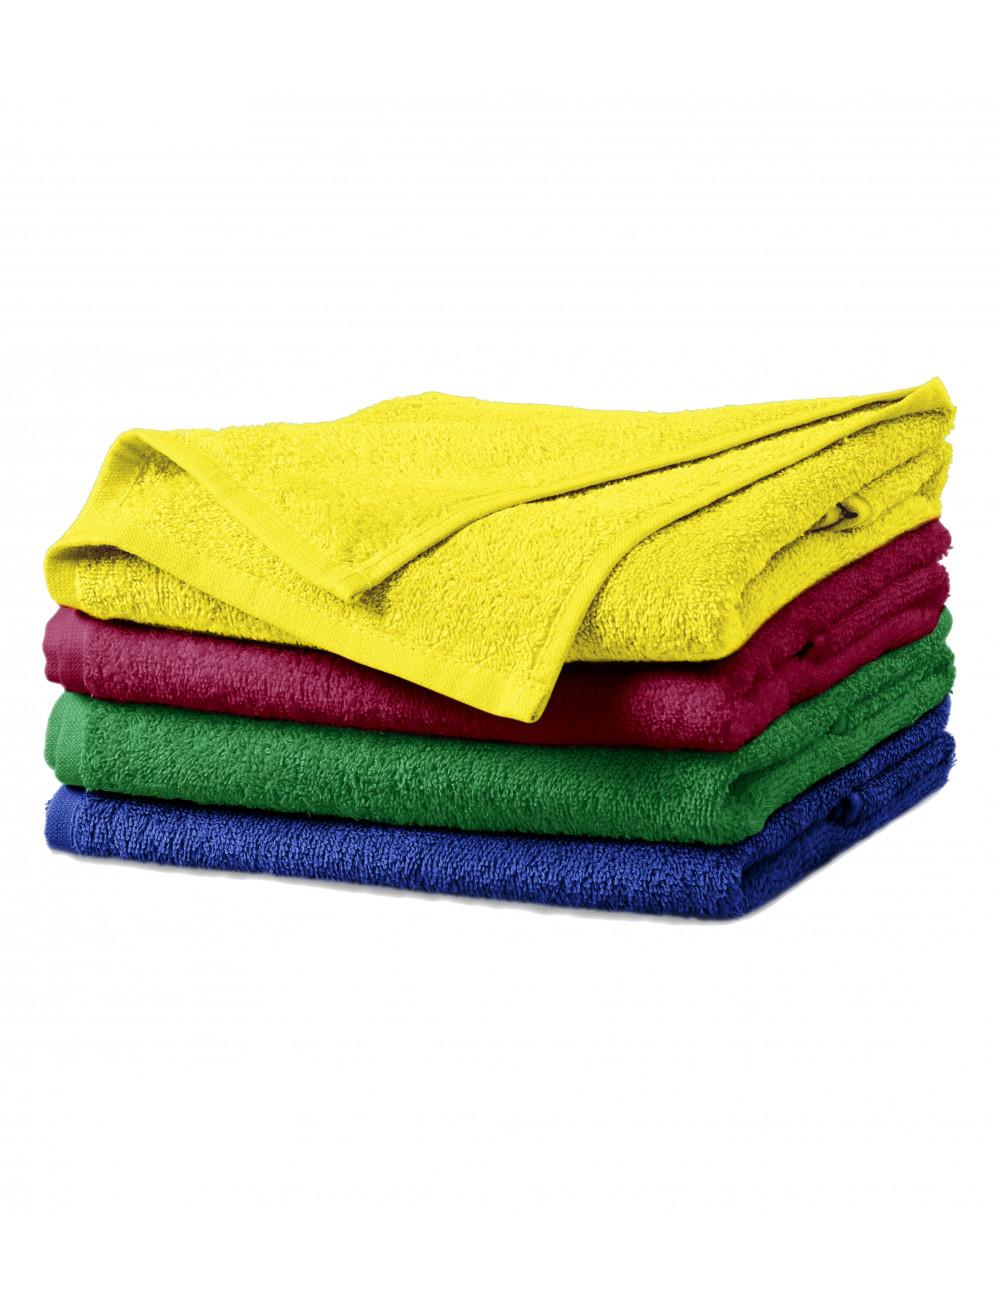 Adler MALFINI Ręcznik unisex Terry Towel 908 cytrynowy